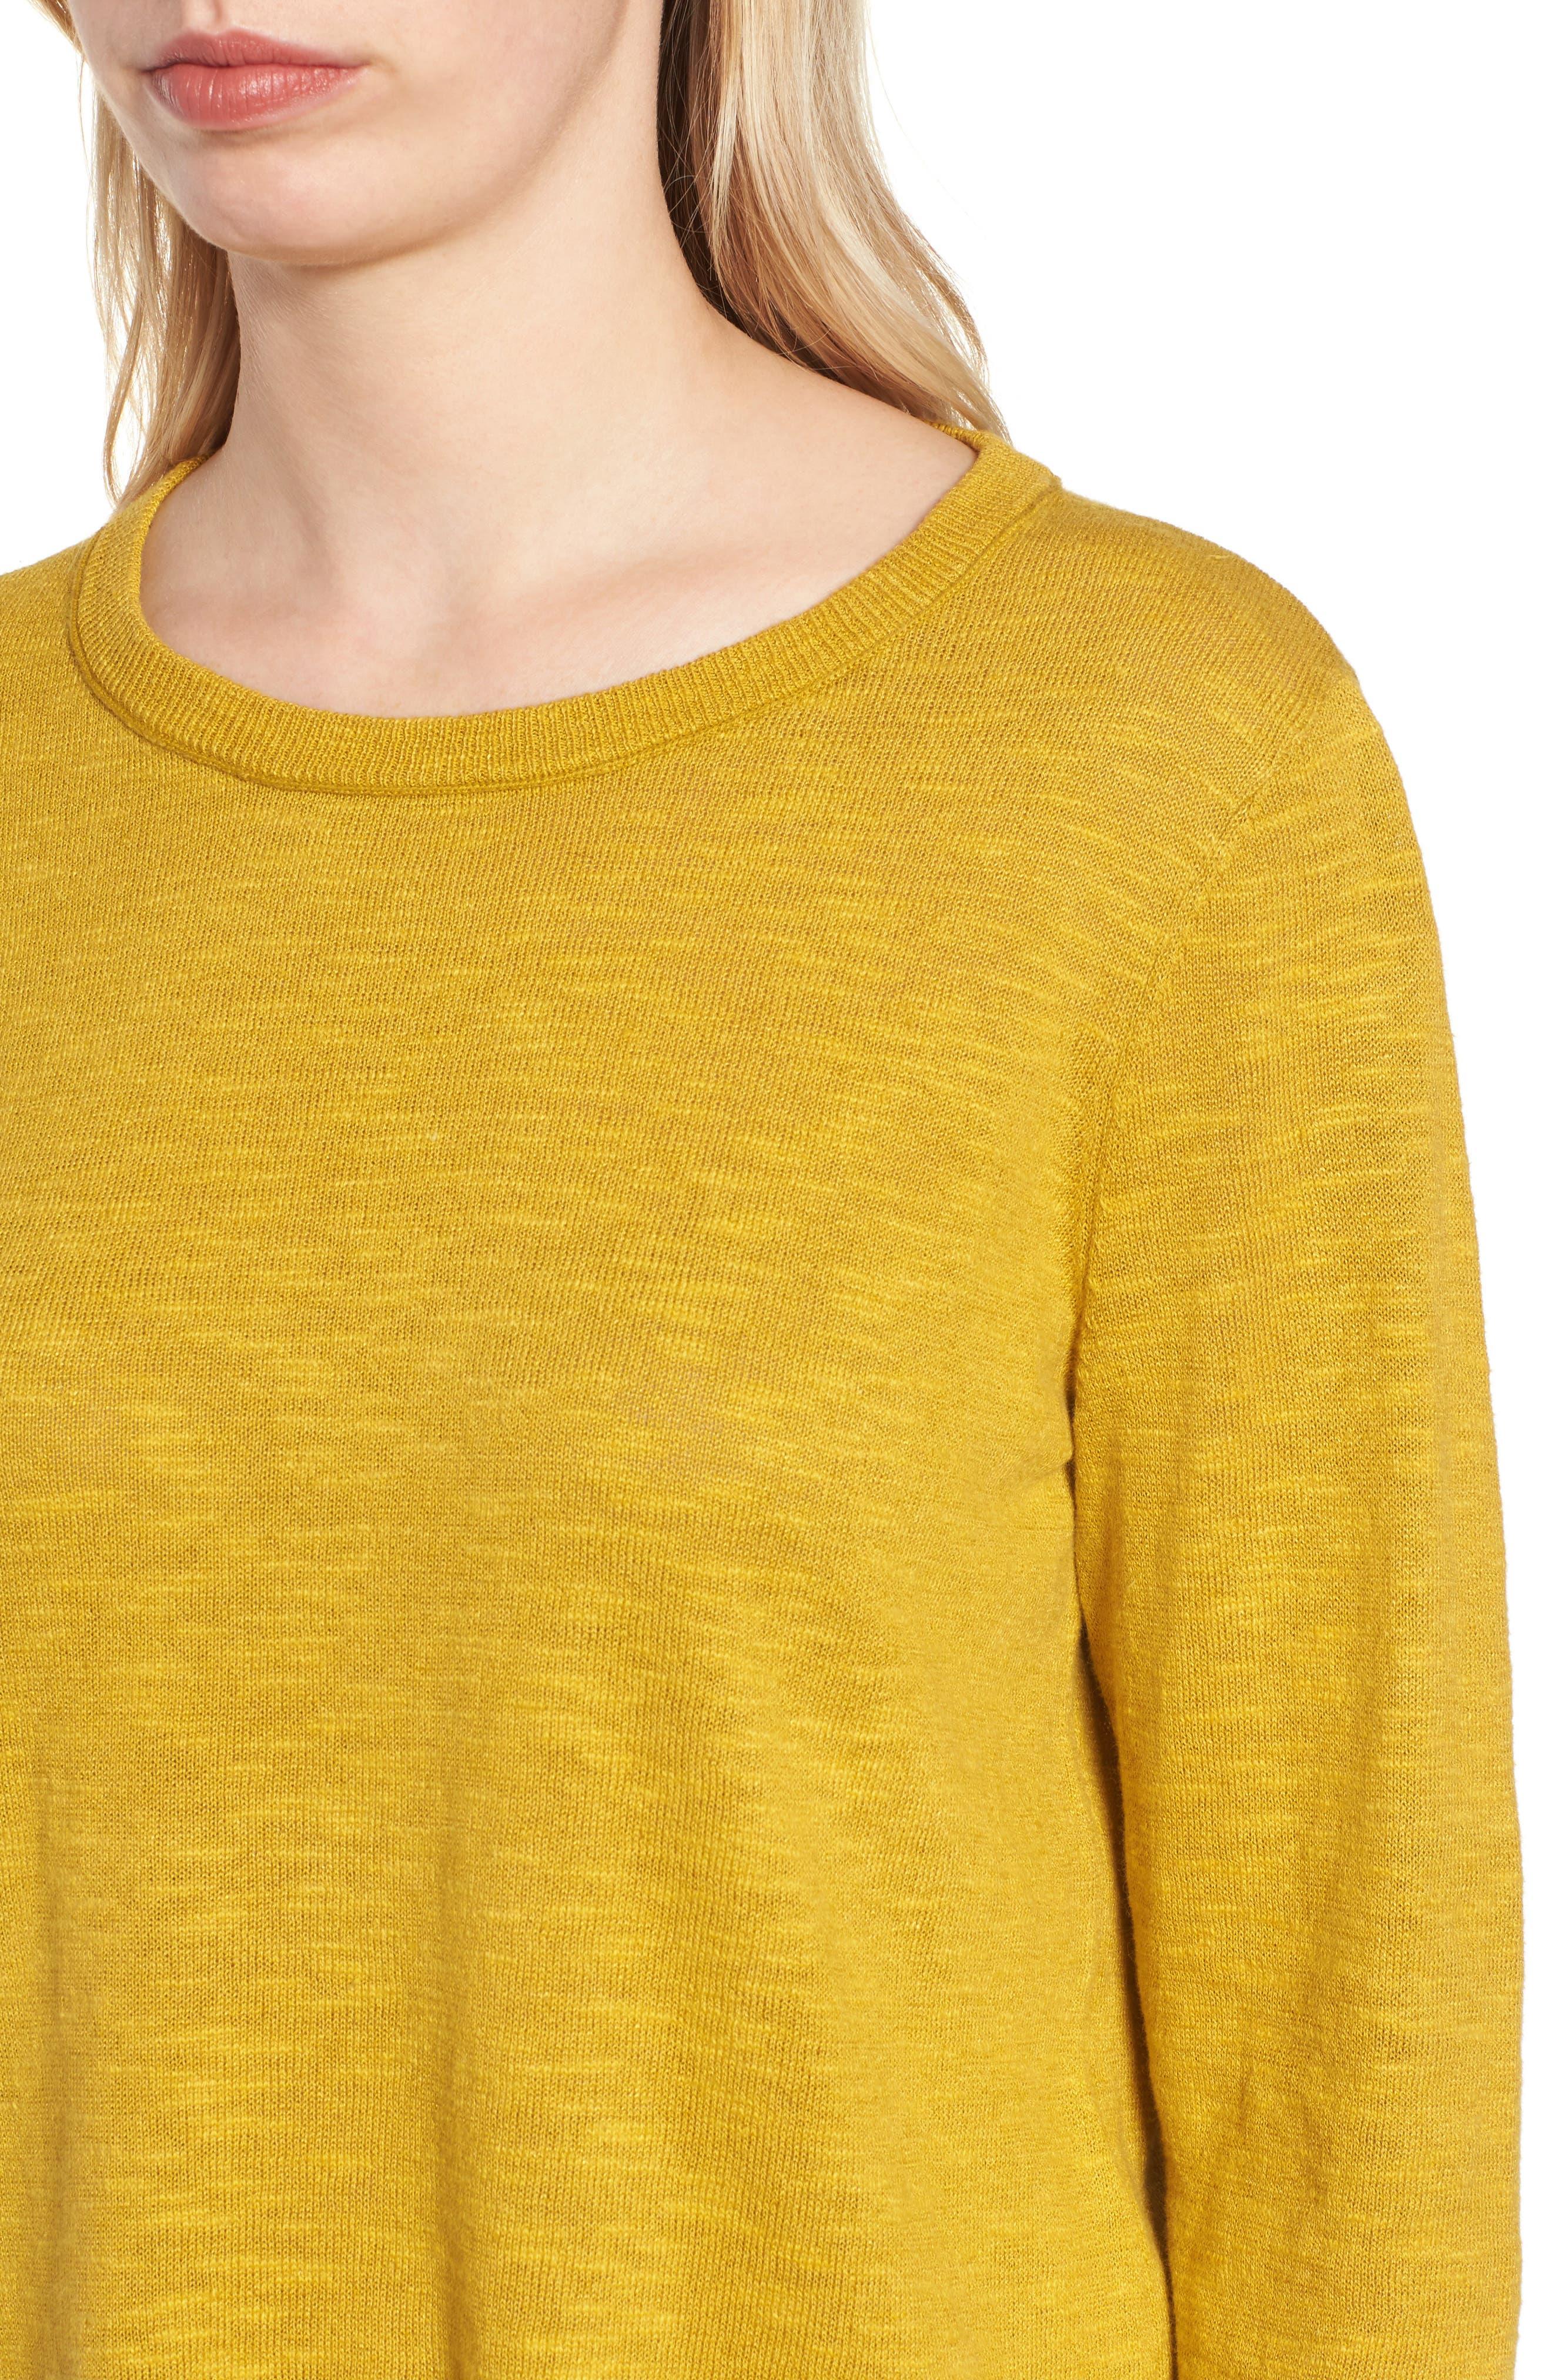 Organic Knit Crewneck Tunic Top,                             Alternate thumbnail 4, color,                             750